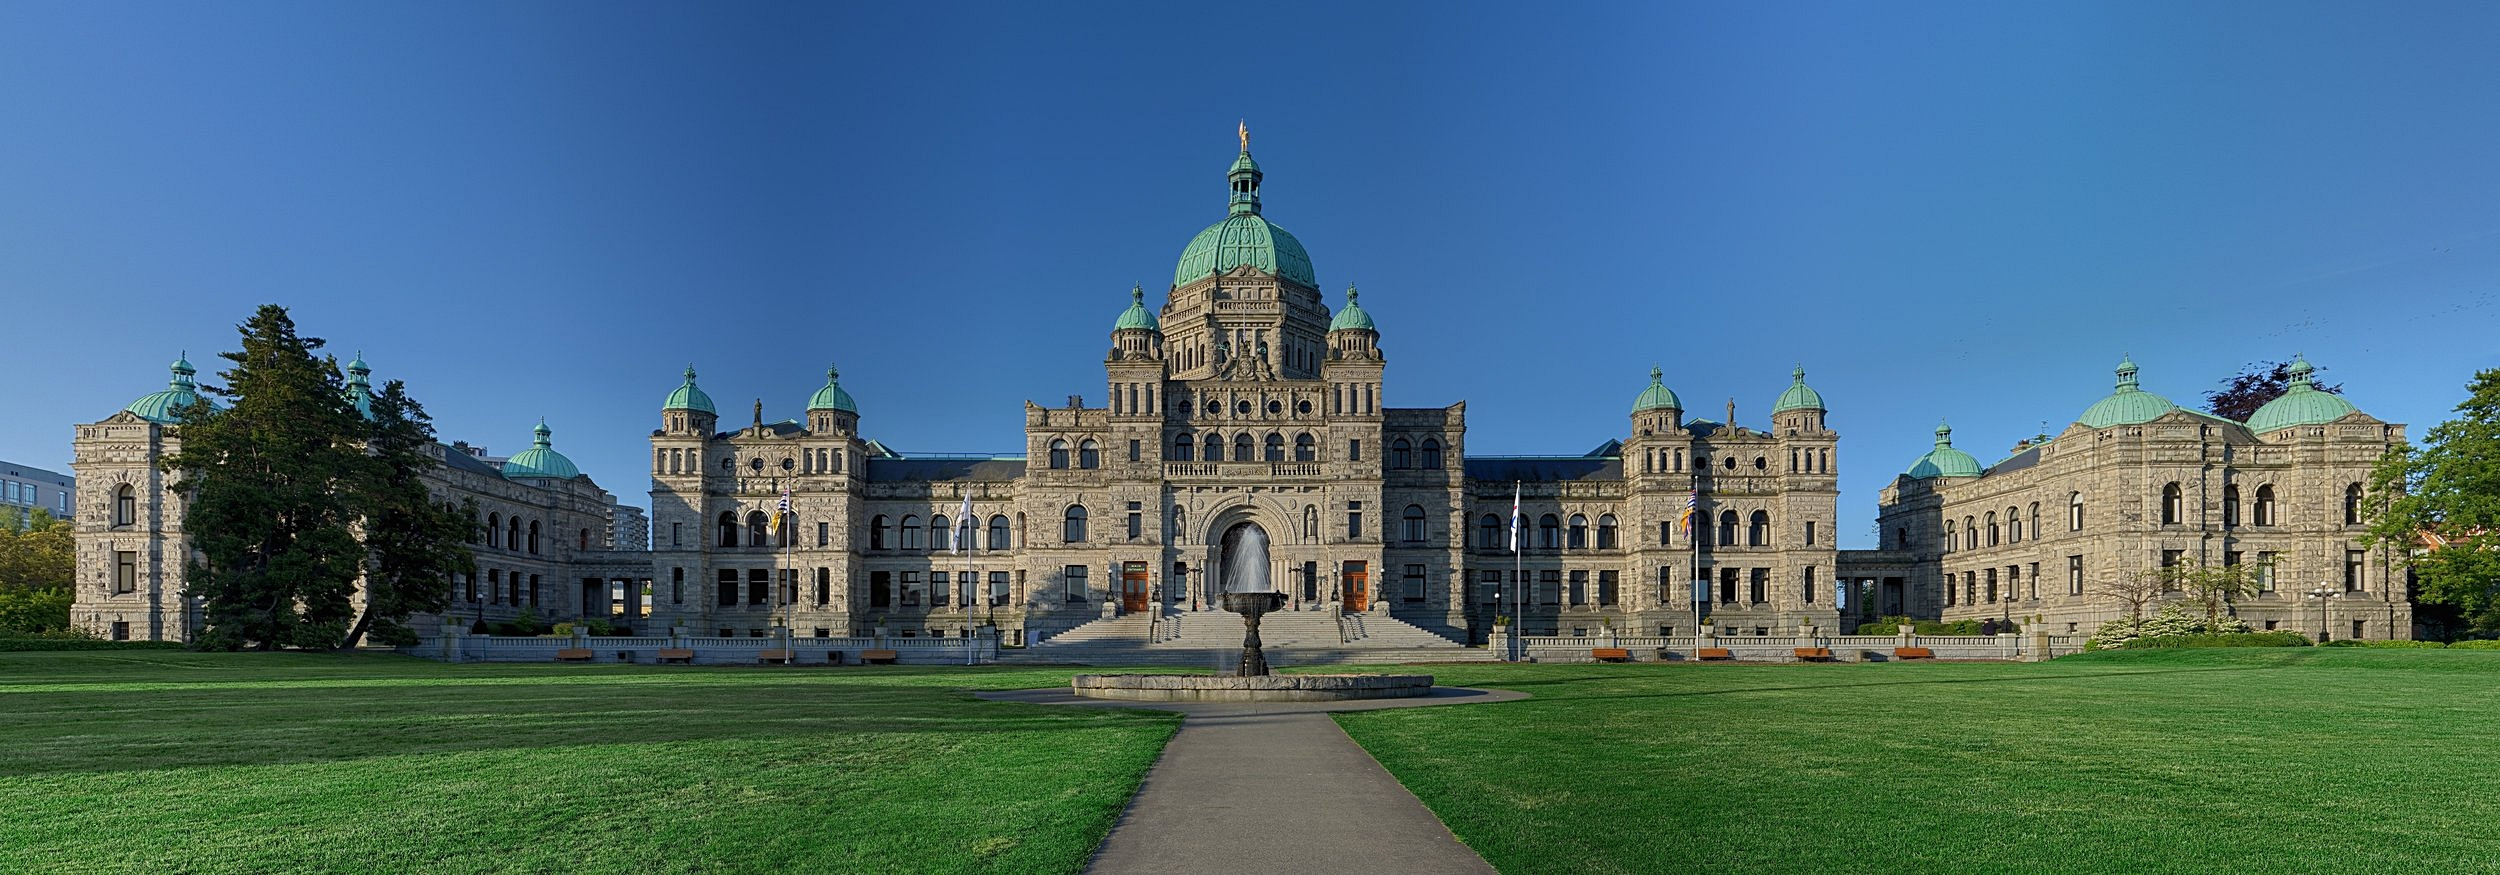 British_Columbia_Parliament_Buildings cropped.jpg